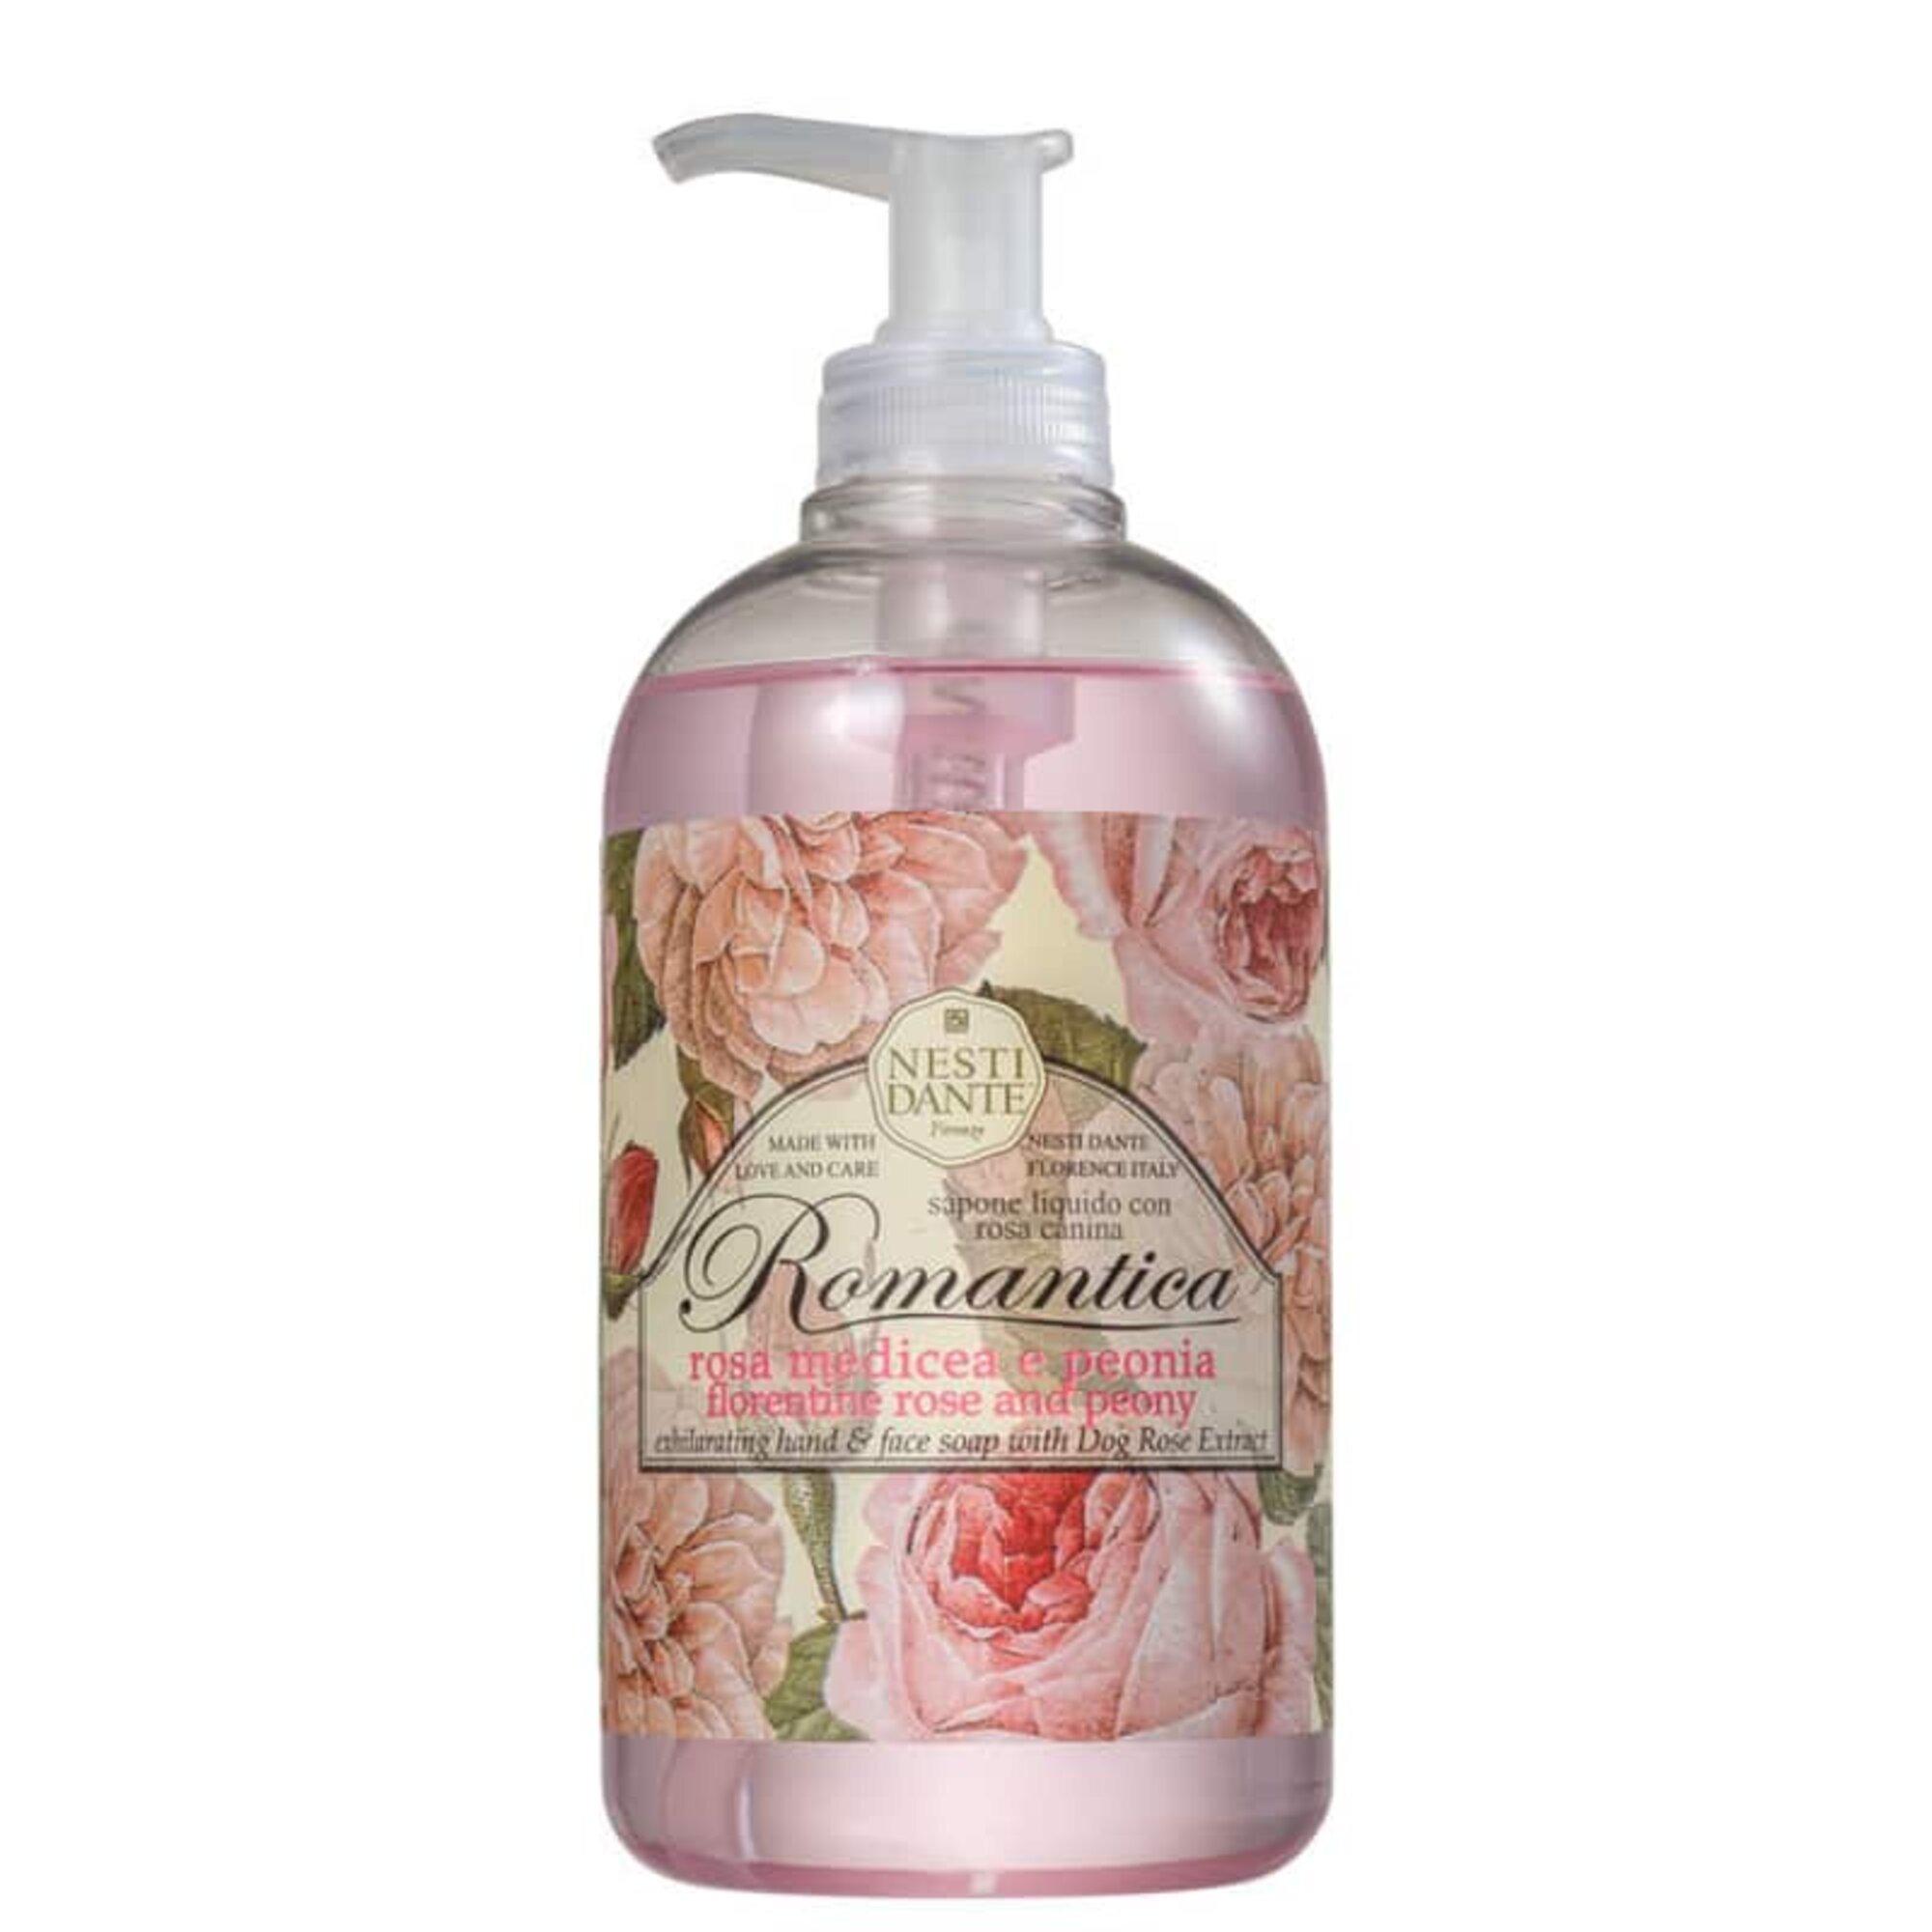 Sabonete Líquido Romantica Rosa Medicea e Peonia 500 mL Nesti Dante